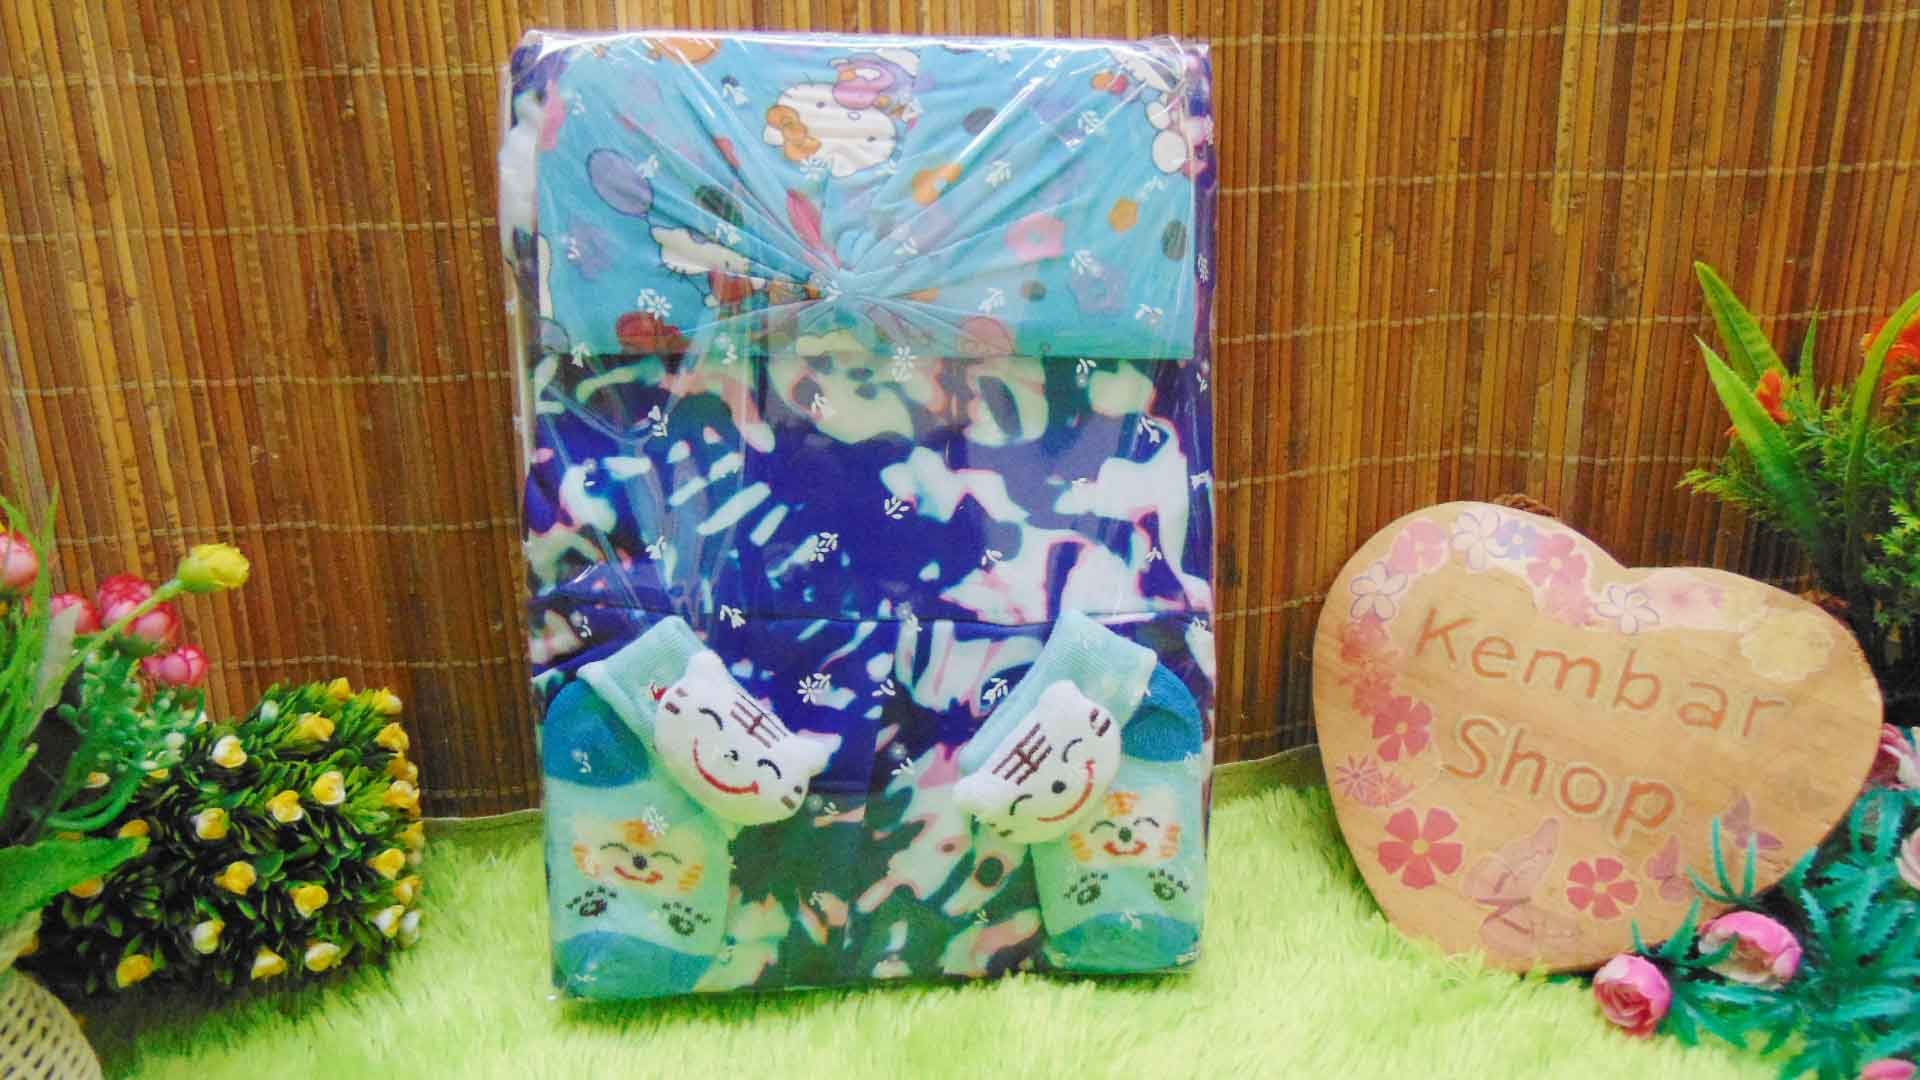 FREE KARTU UCAPAN TERMURAH COD Paket Kado Bayi Perempuan Baby Gift Set Girl Dress Sock Turban Random (4)